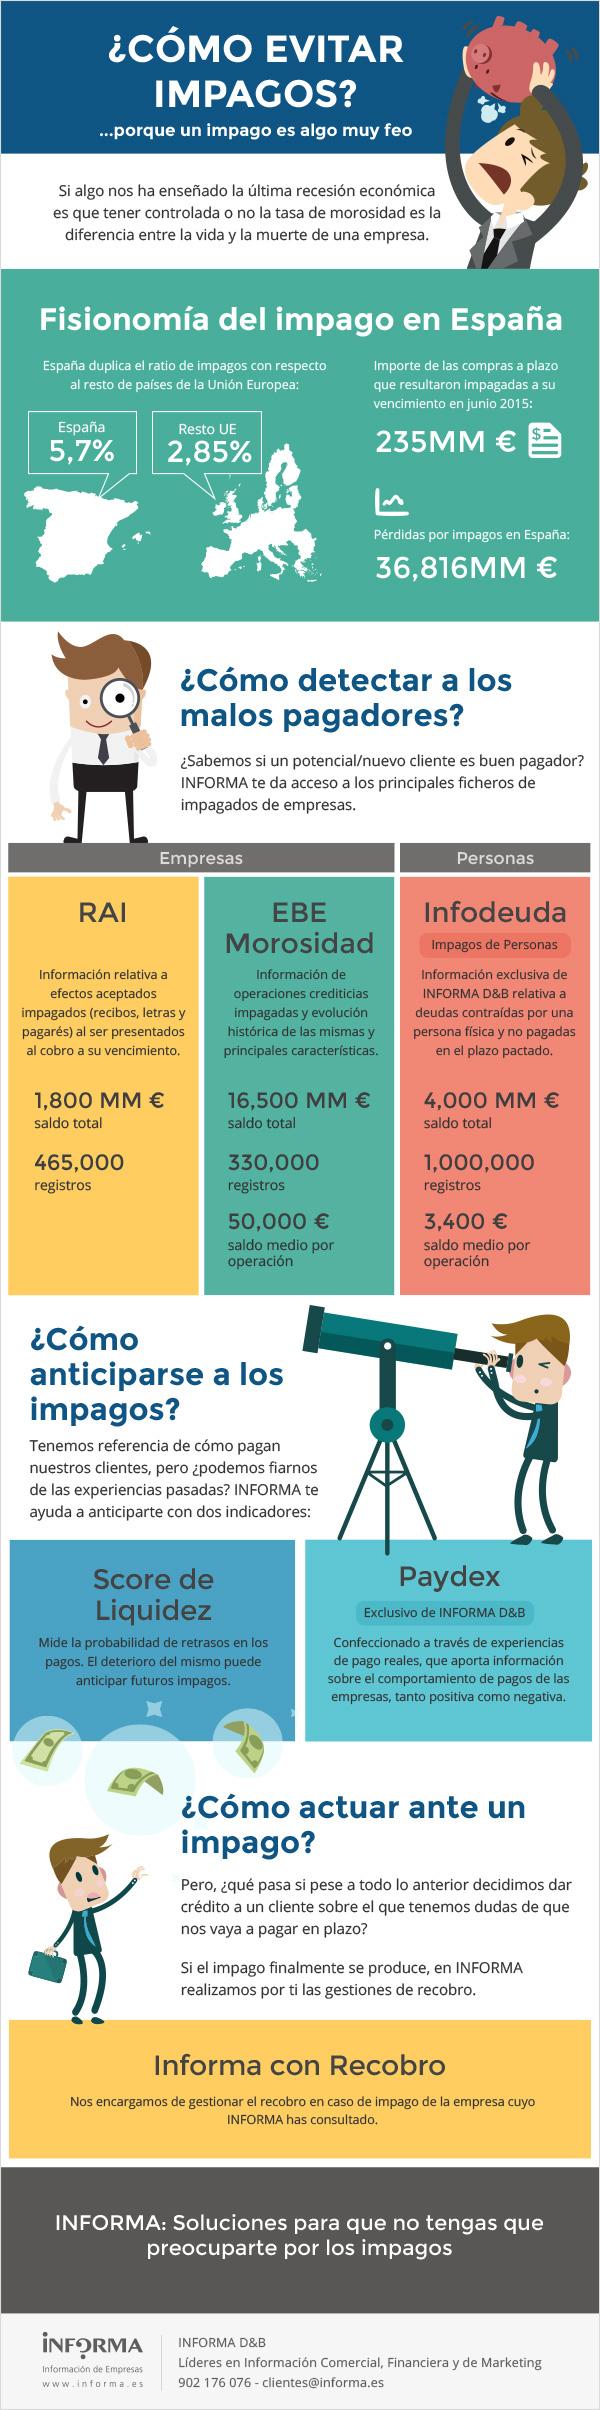 Cómo evitar impagos #infografia #infographic